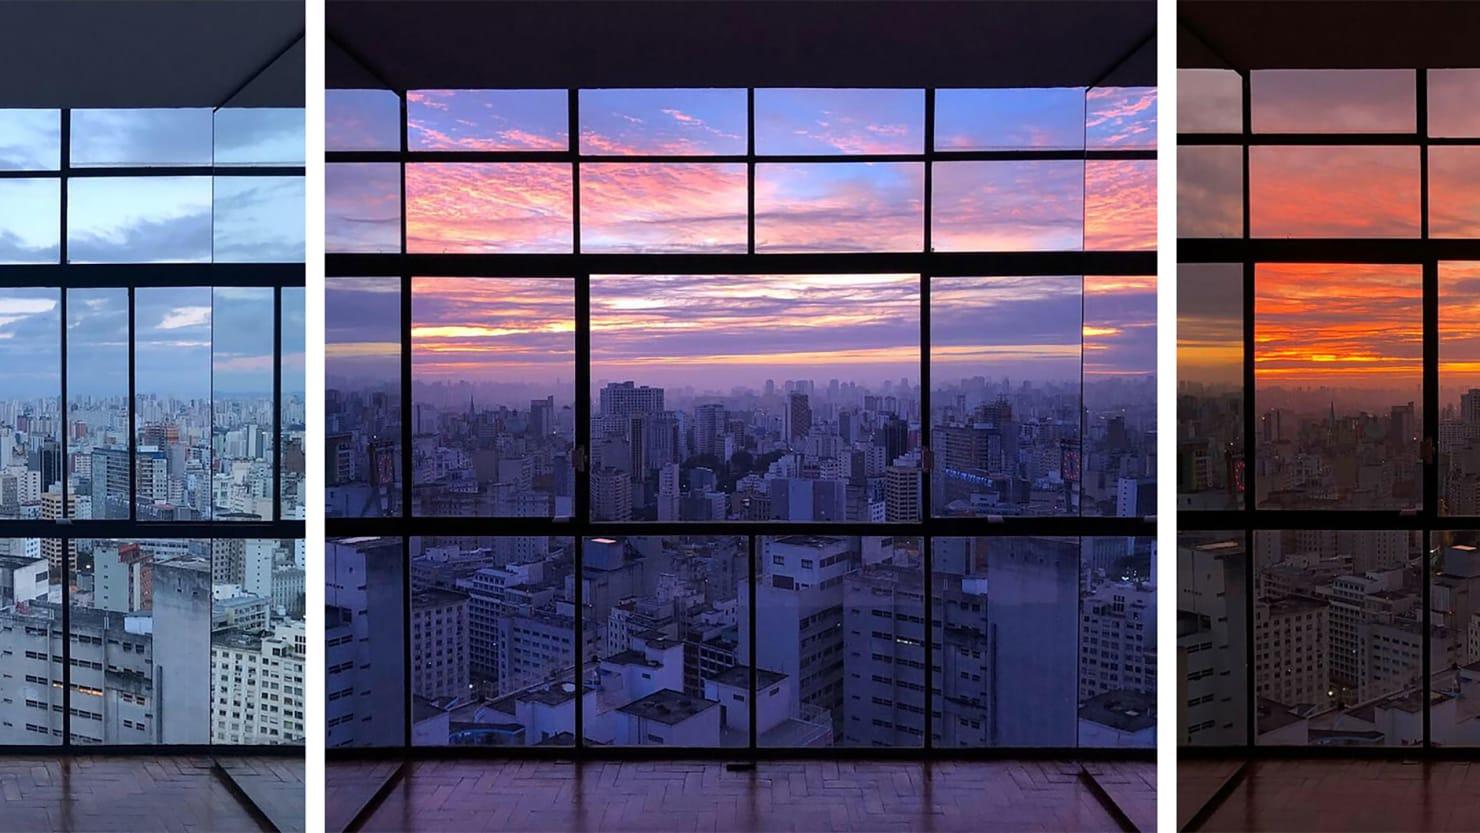 The Oscar Niemeyer Apartment with an Insane São Paulo Sunrise